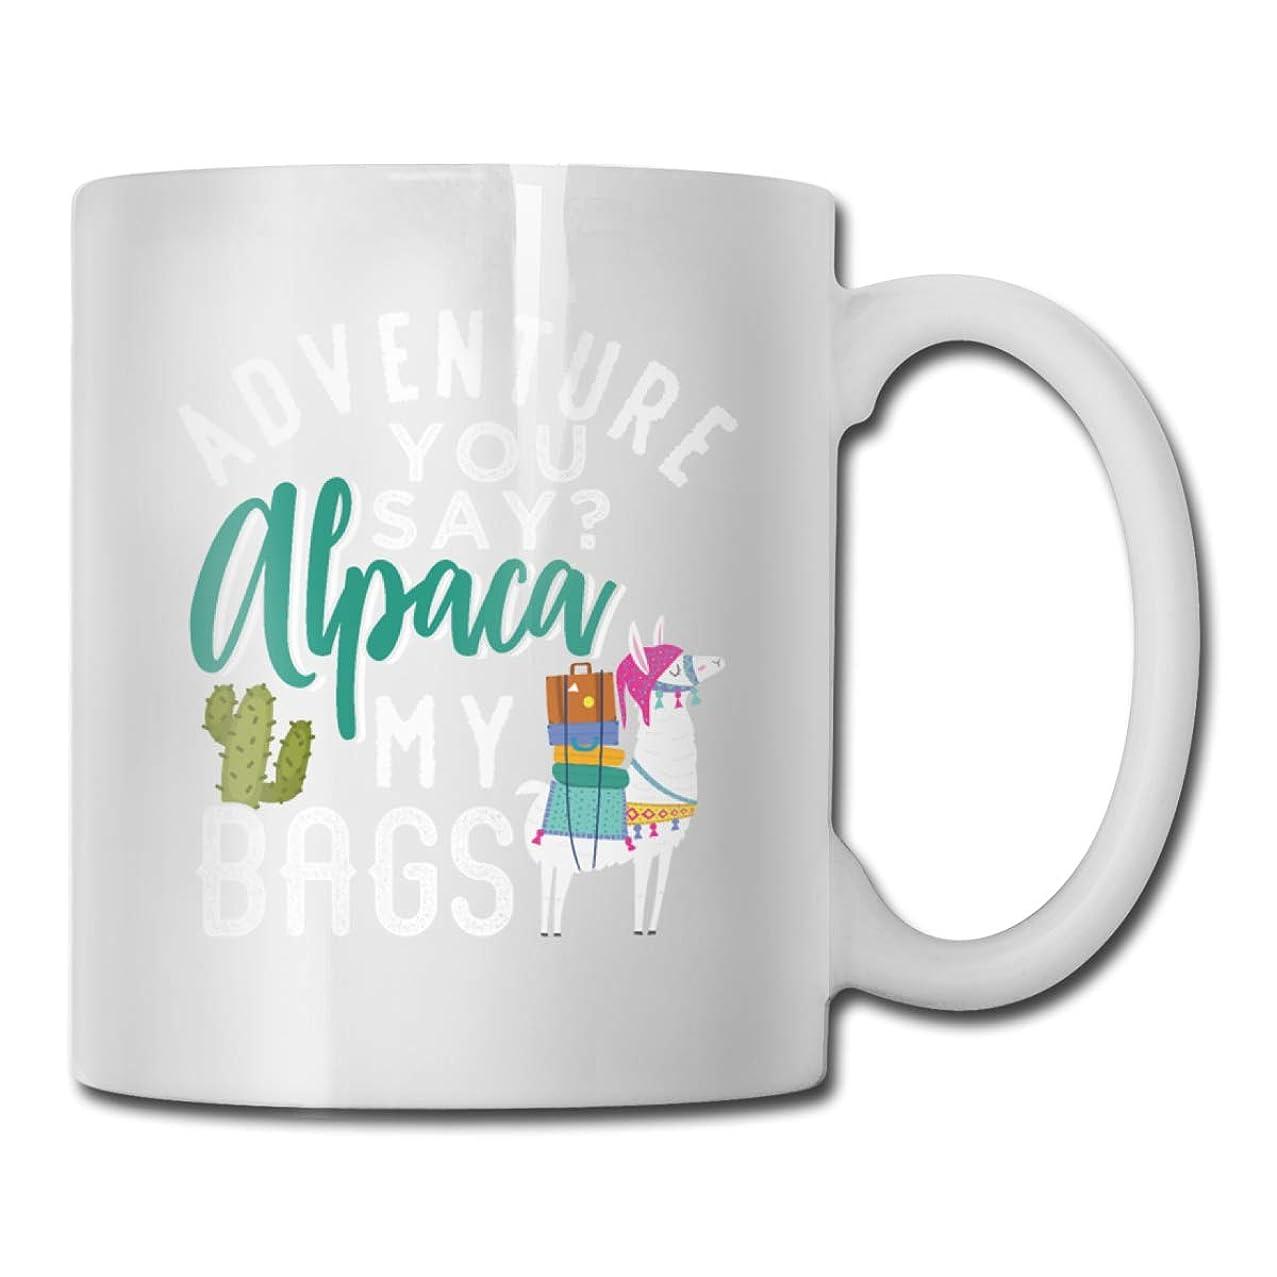 Roing Bo Coffee Mugs 11oz Funny Cup Milk Juice Or Tea Cup Adventure You Say Alpaca My Bags Birthday